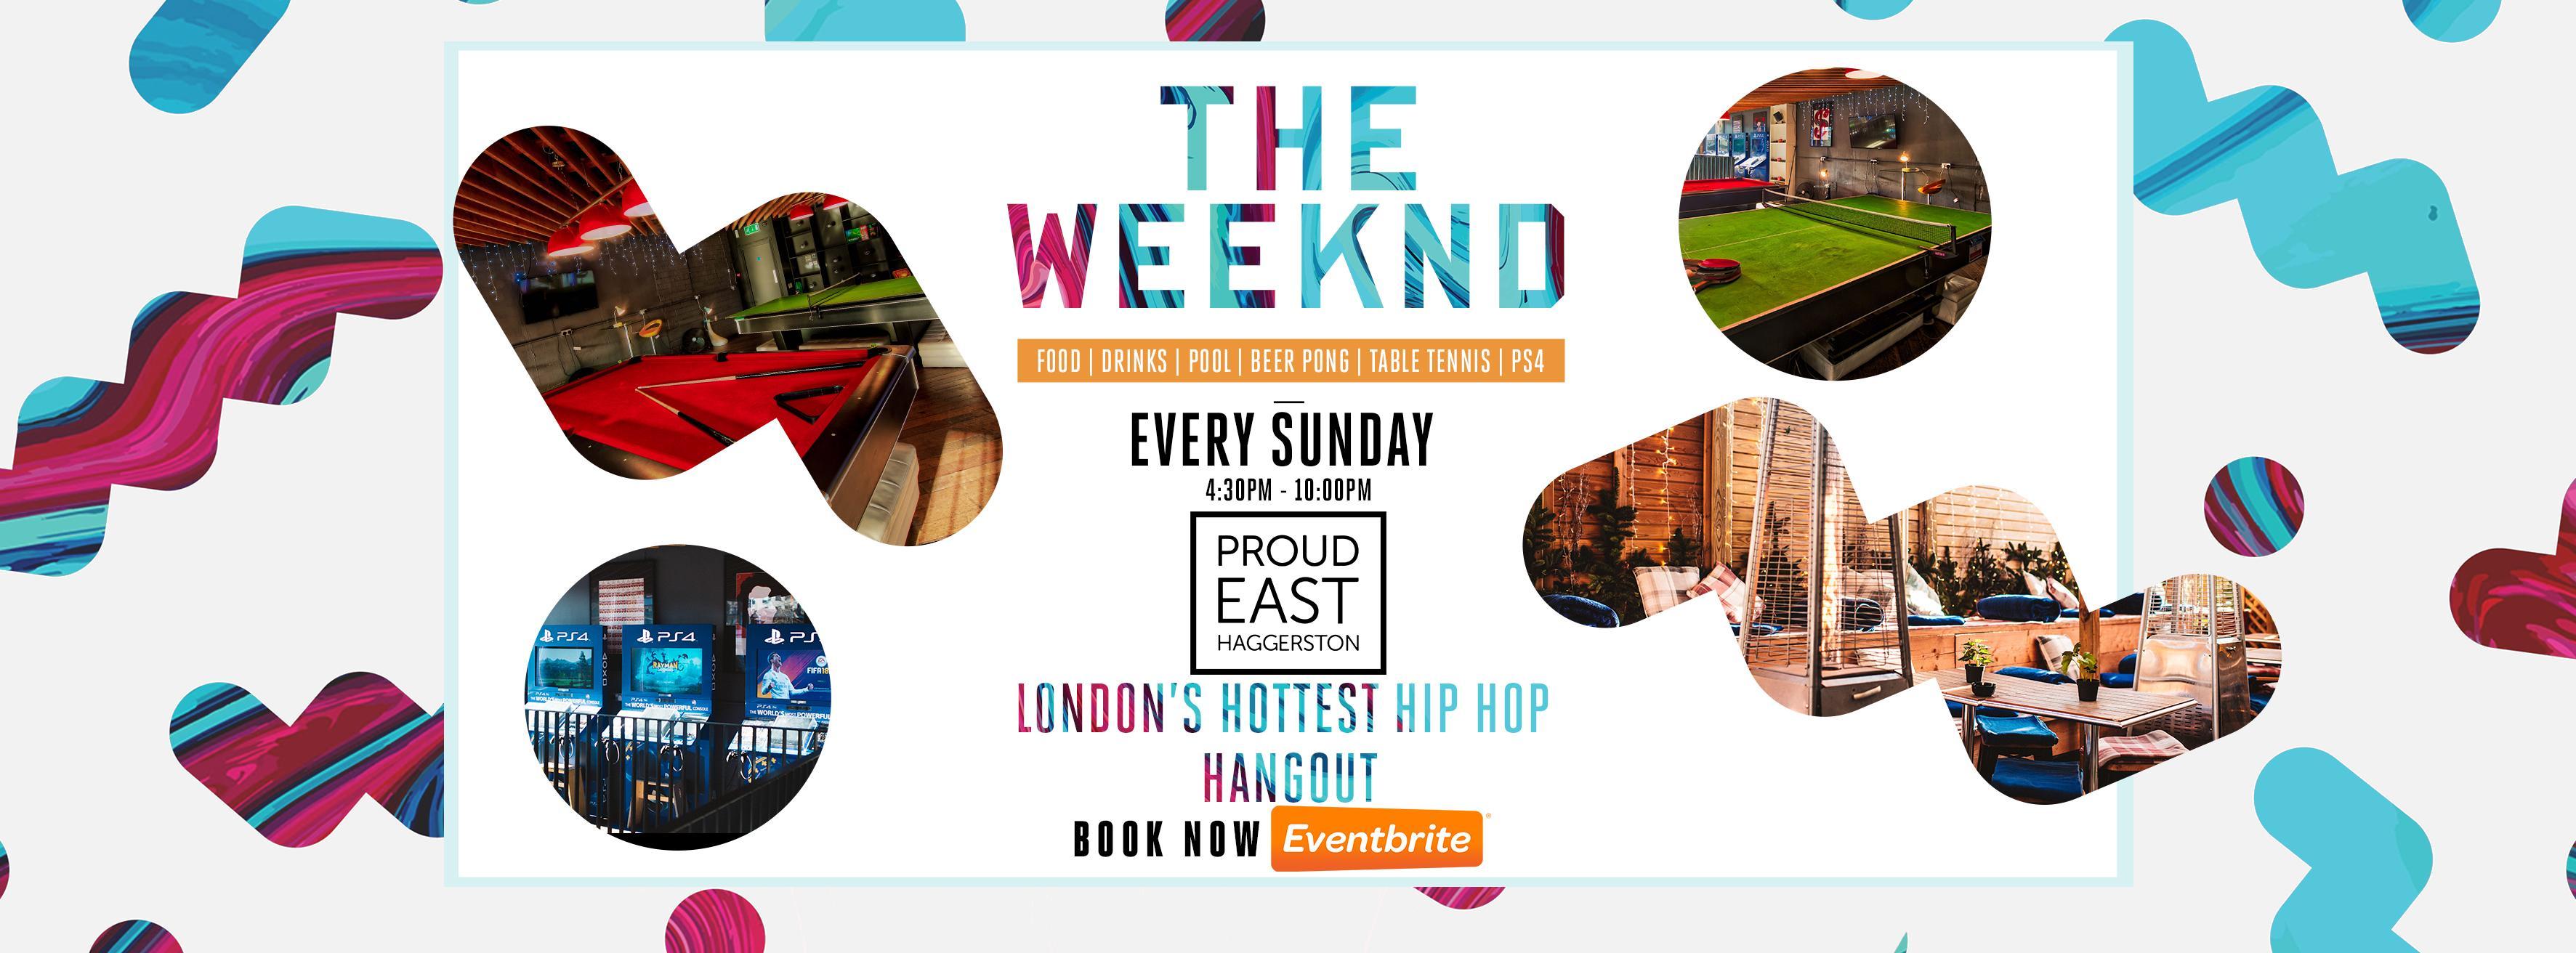 London's Hip Hop Hangout: The Weeknd